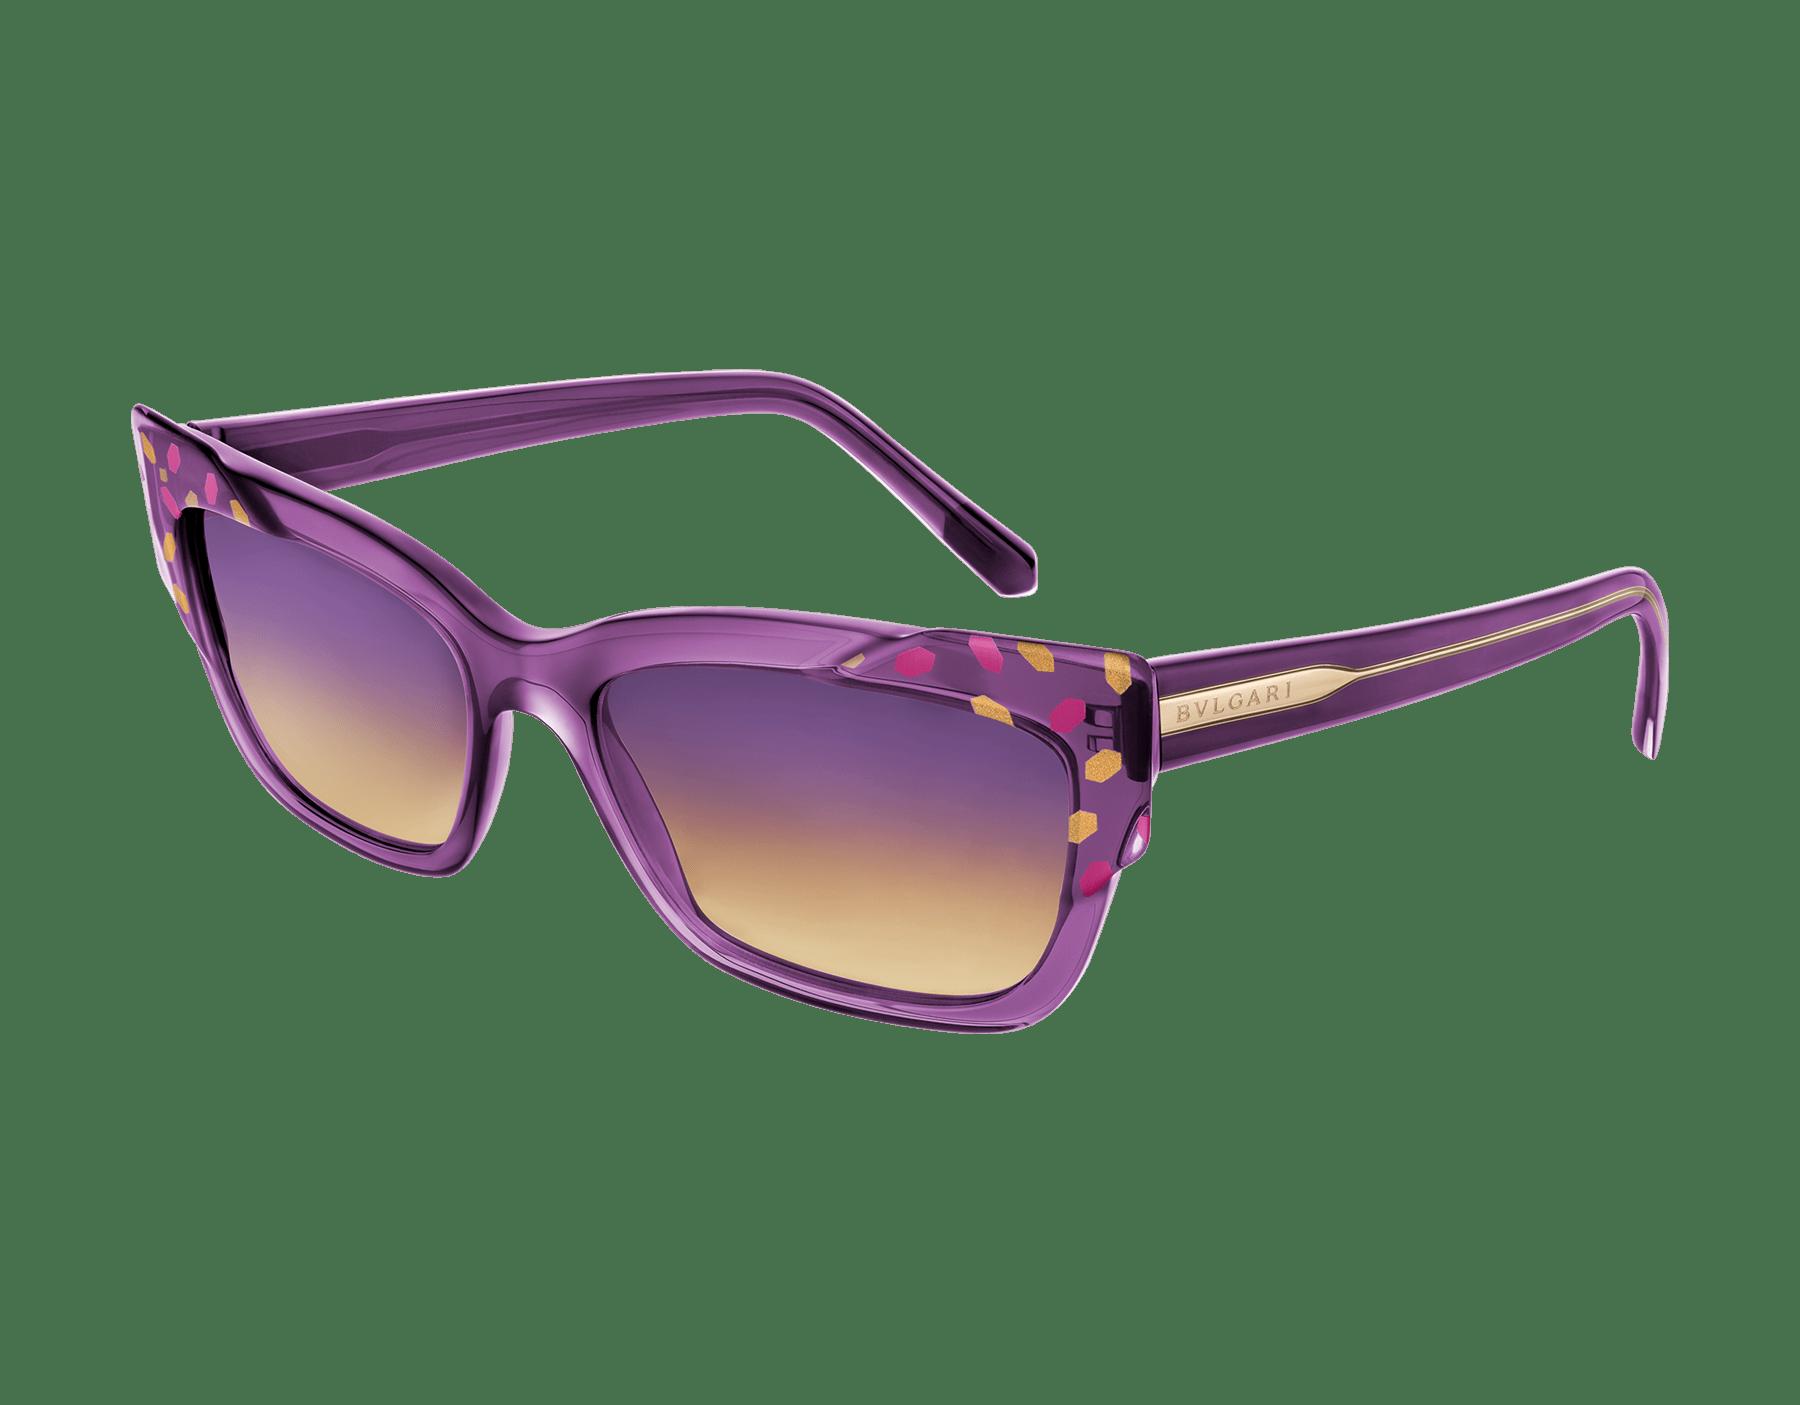 Bvlgari Serpenti Scale-blast rectangular cat-eye acetate sunglasses. 903738 image 1